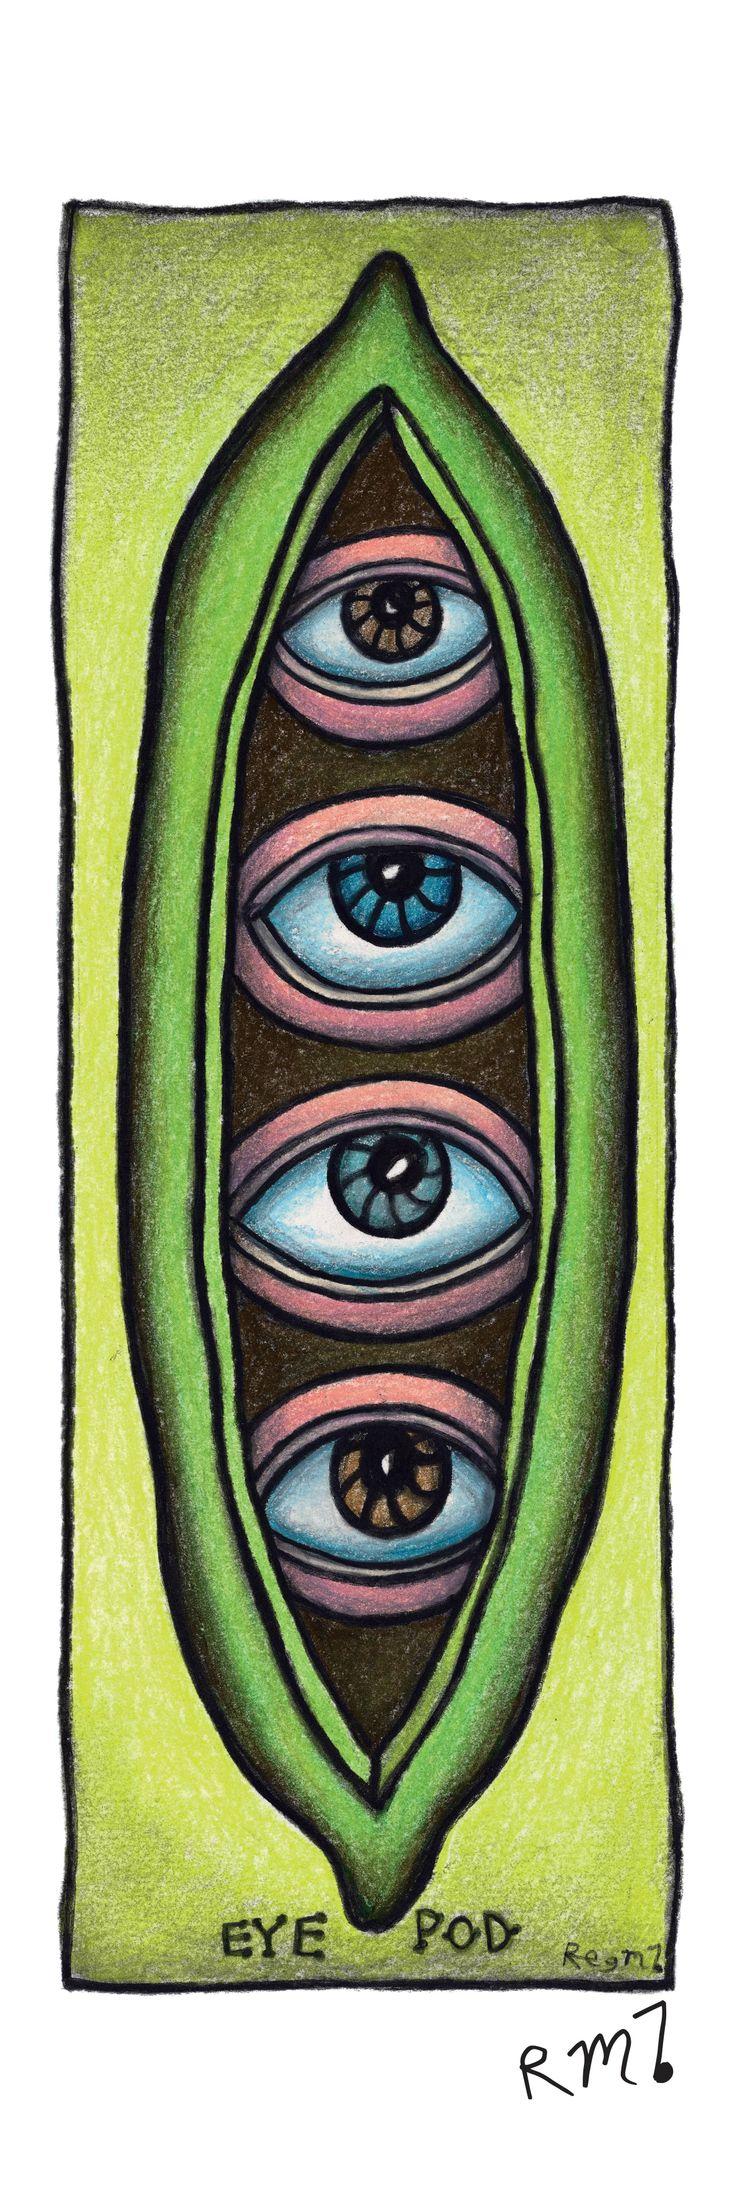 Reg Mombassa ~ NYE2013 Tribute Banner : Eye Pod